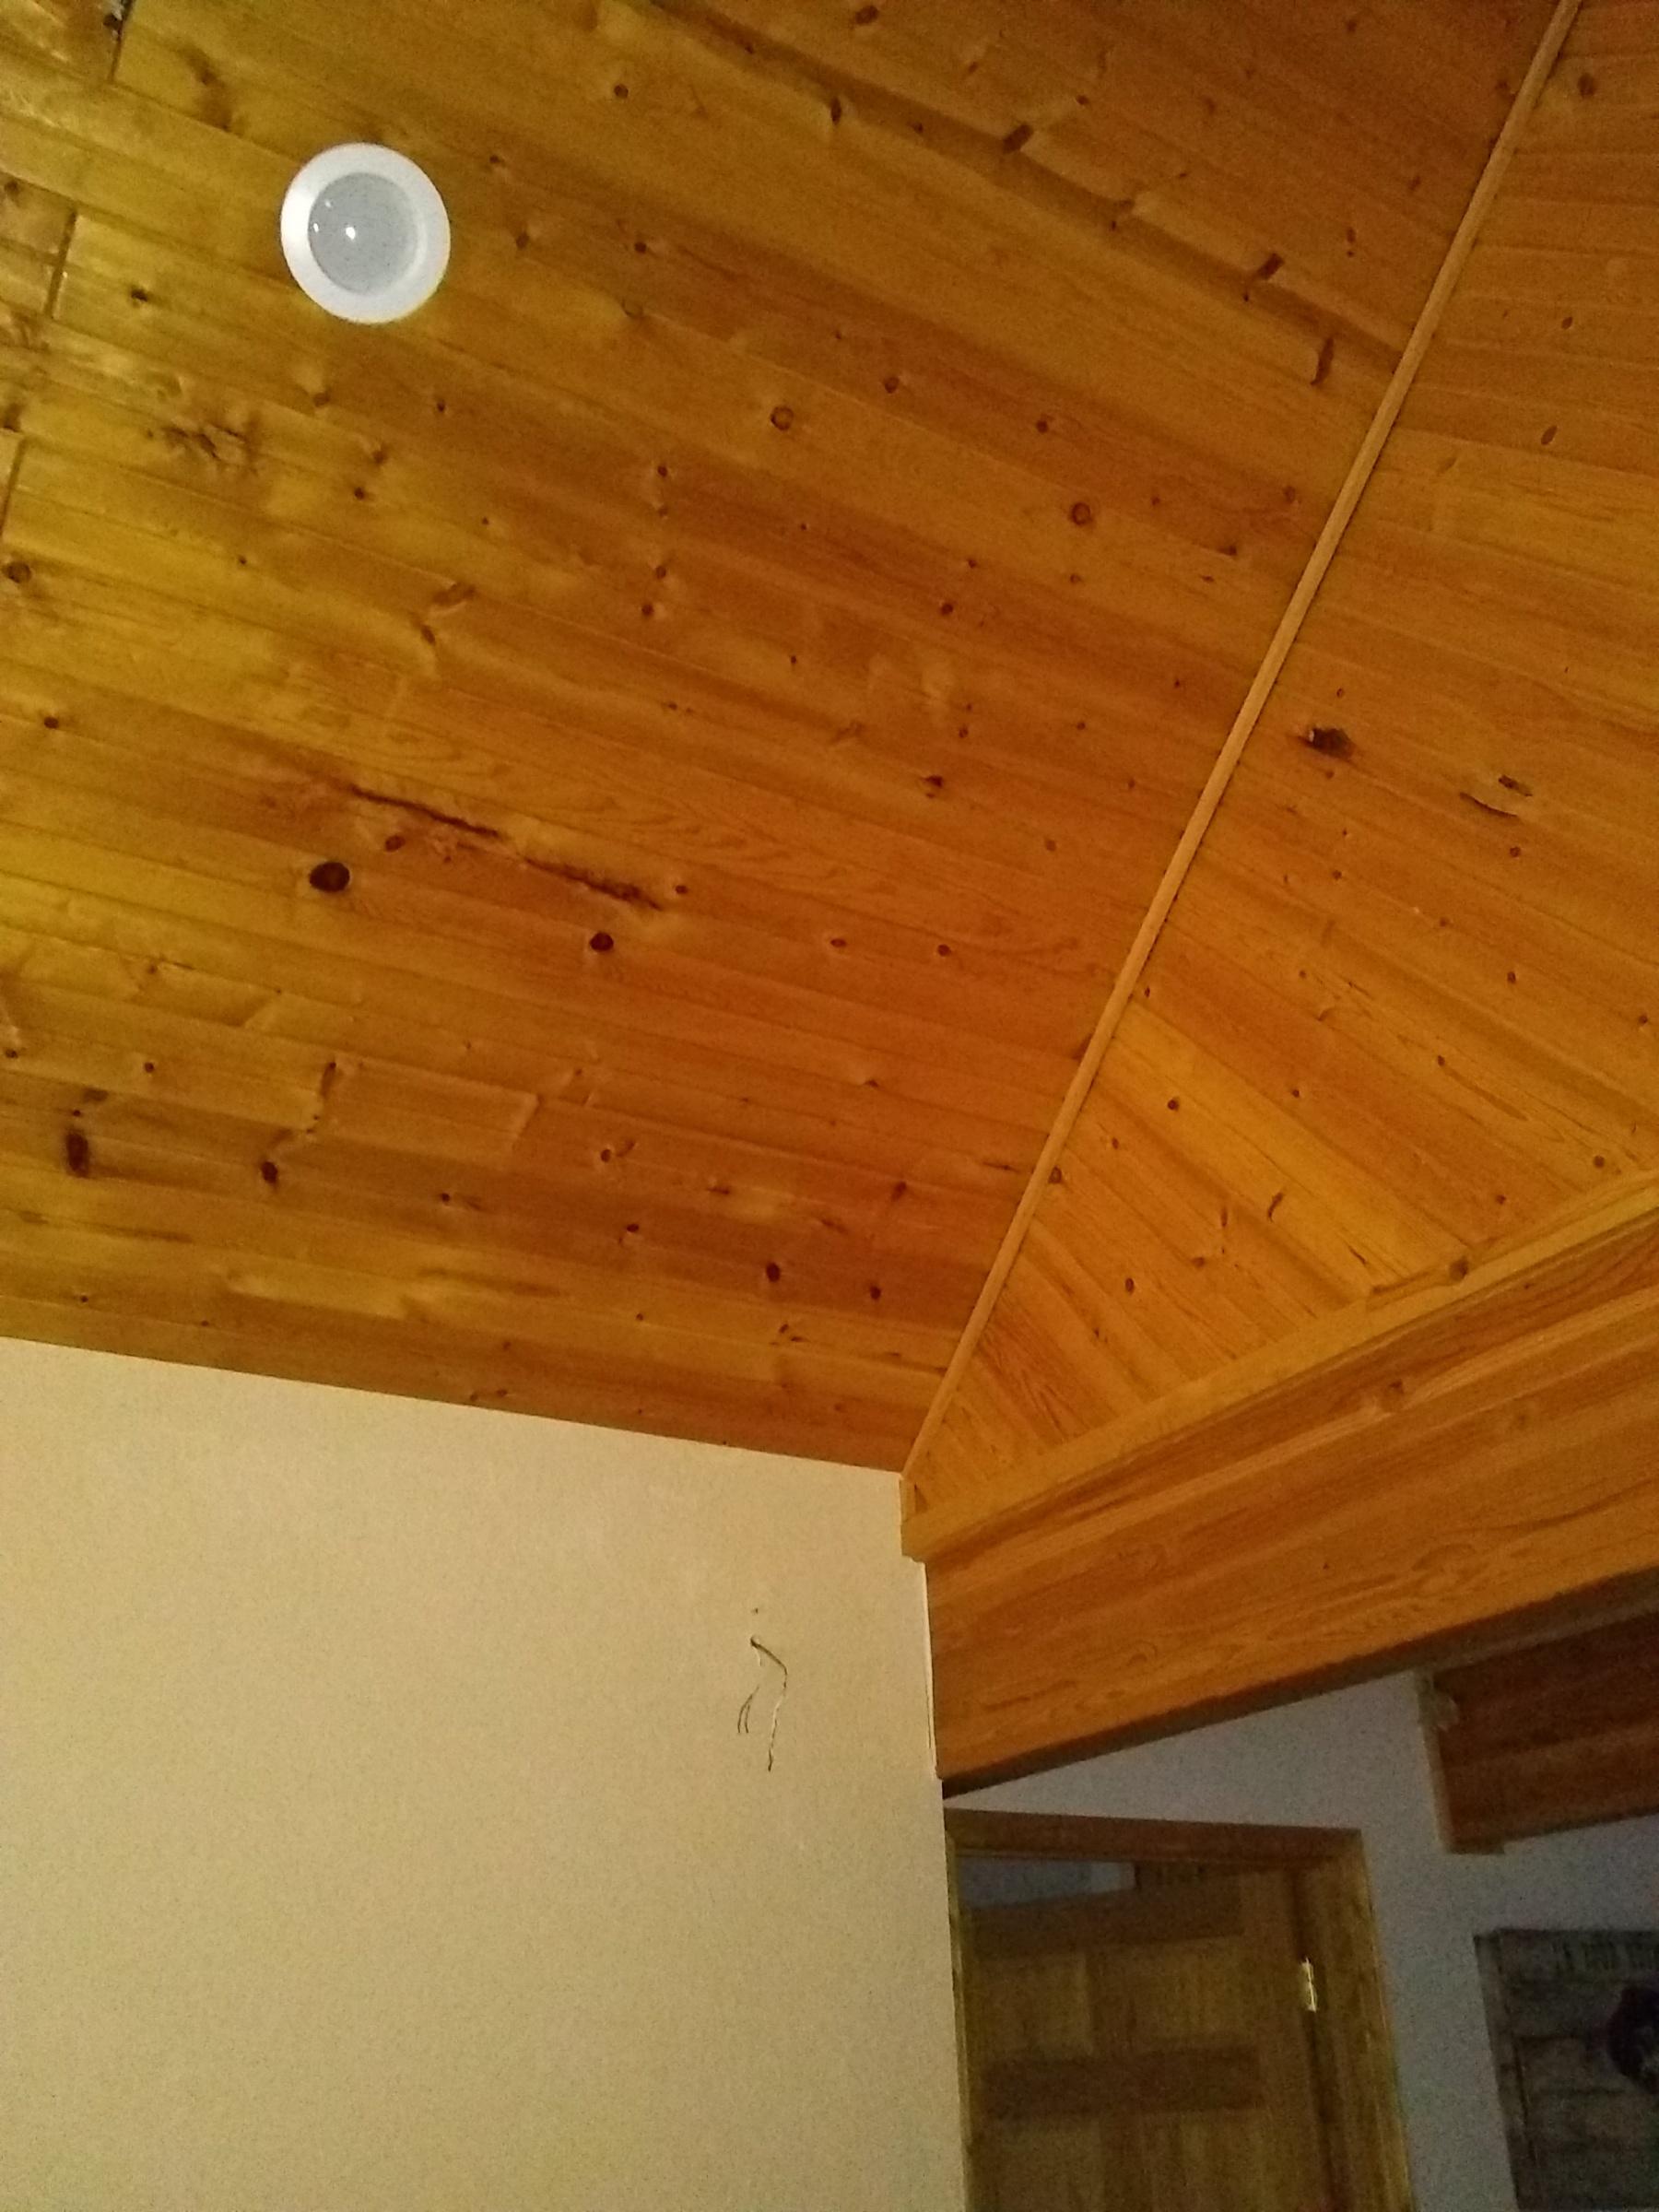 Plan for attic insulation-img_20181109_161119.jpg